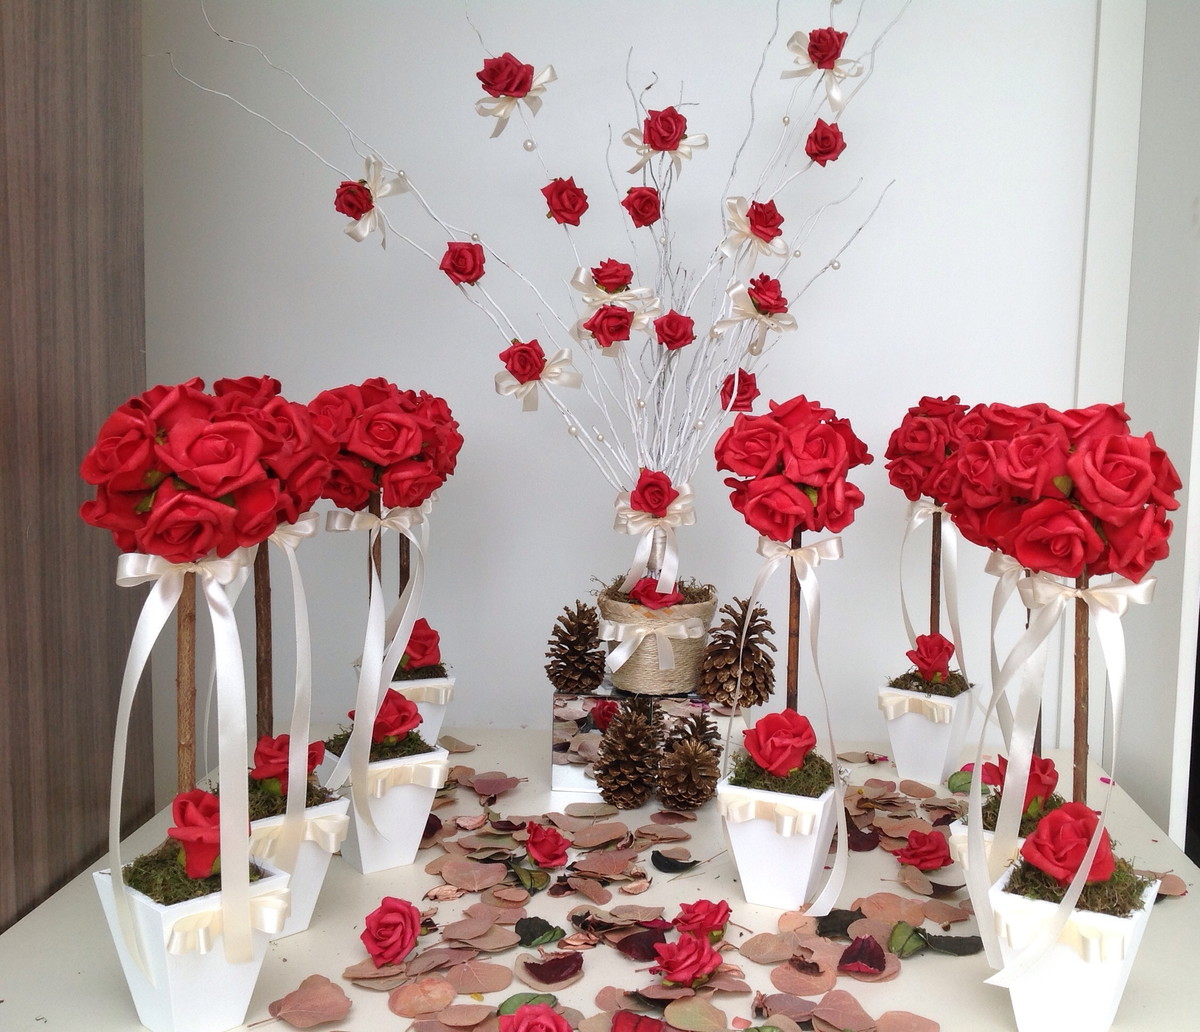 kit-decoracao-vermelho-para-festa-vii-decoracao-festa-bodas.jpg